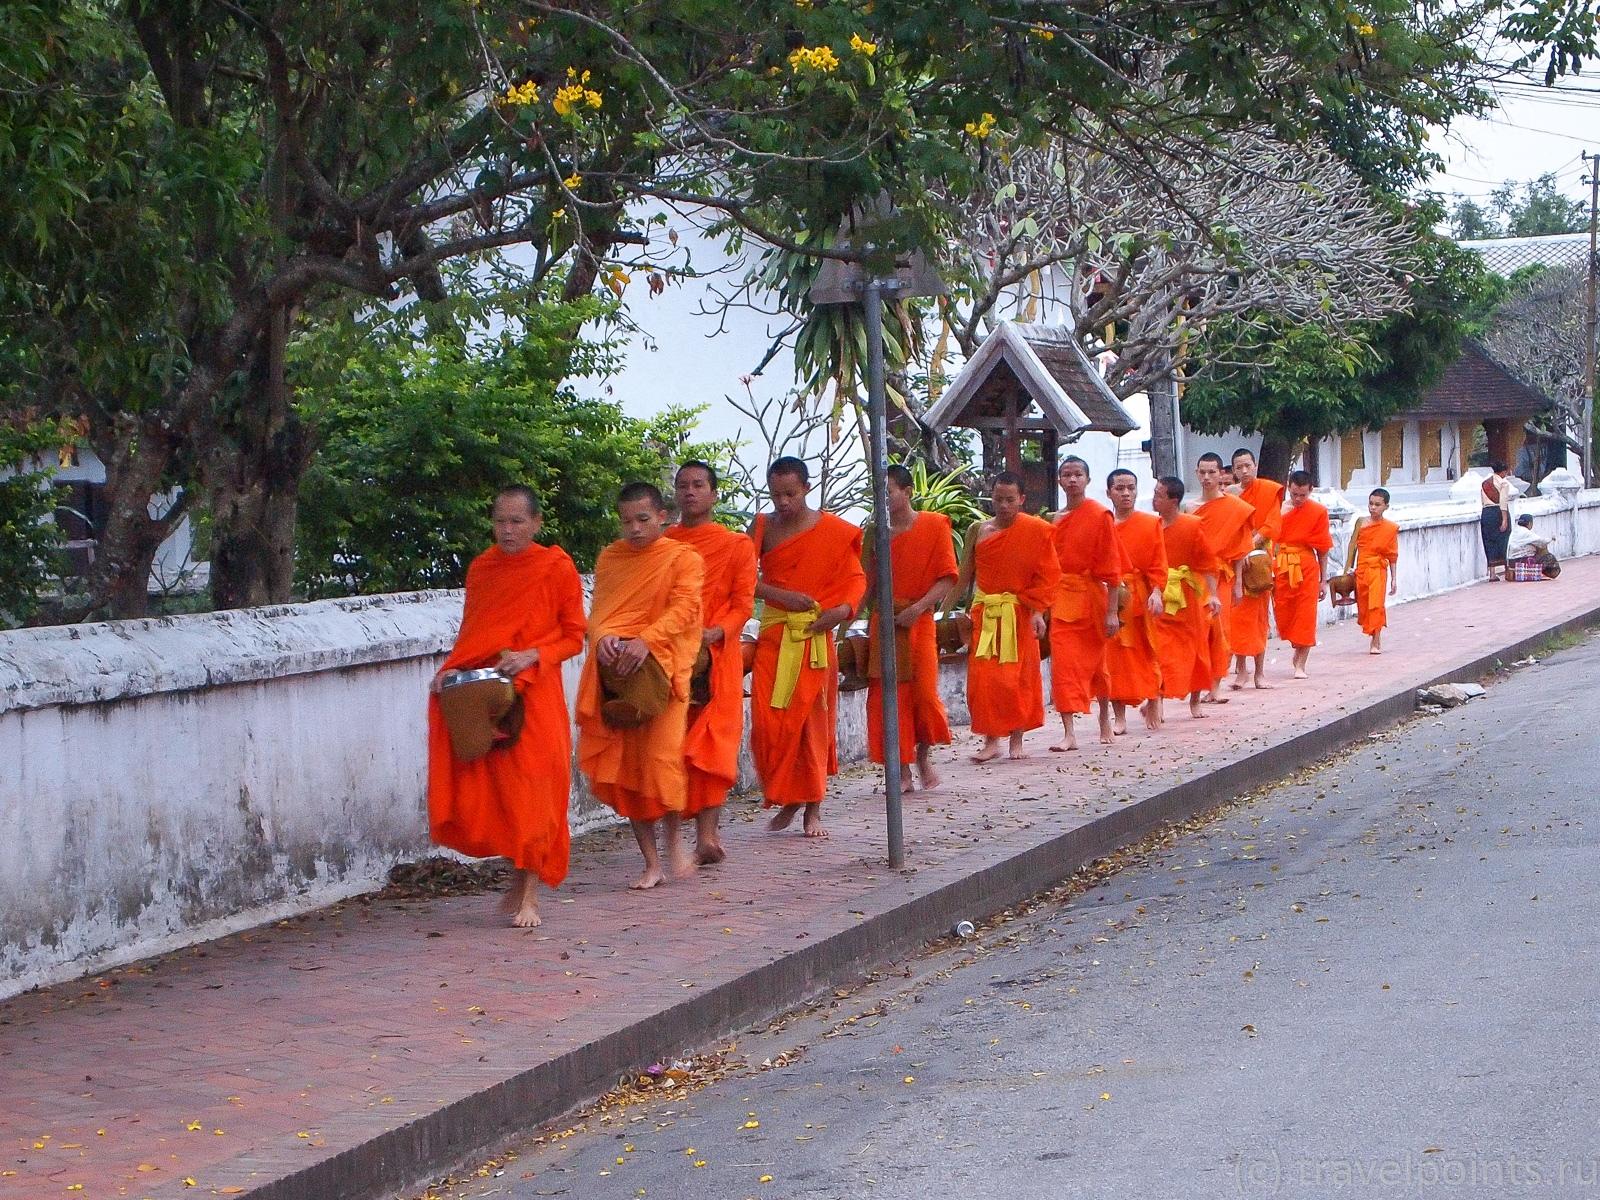 Монахи идут навстречу туристическому безумию